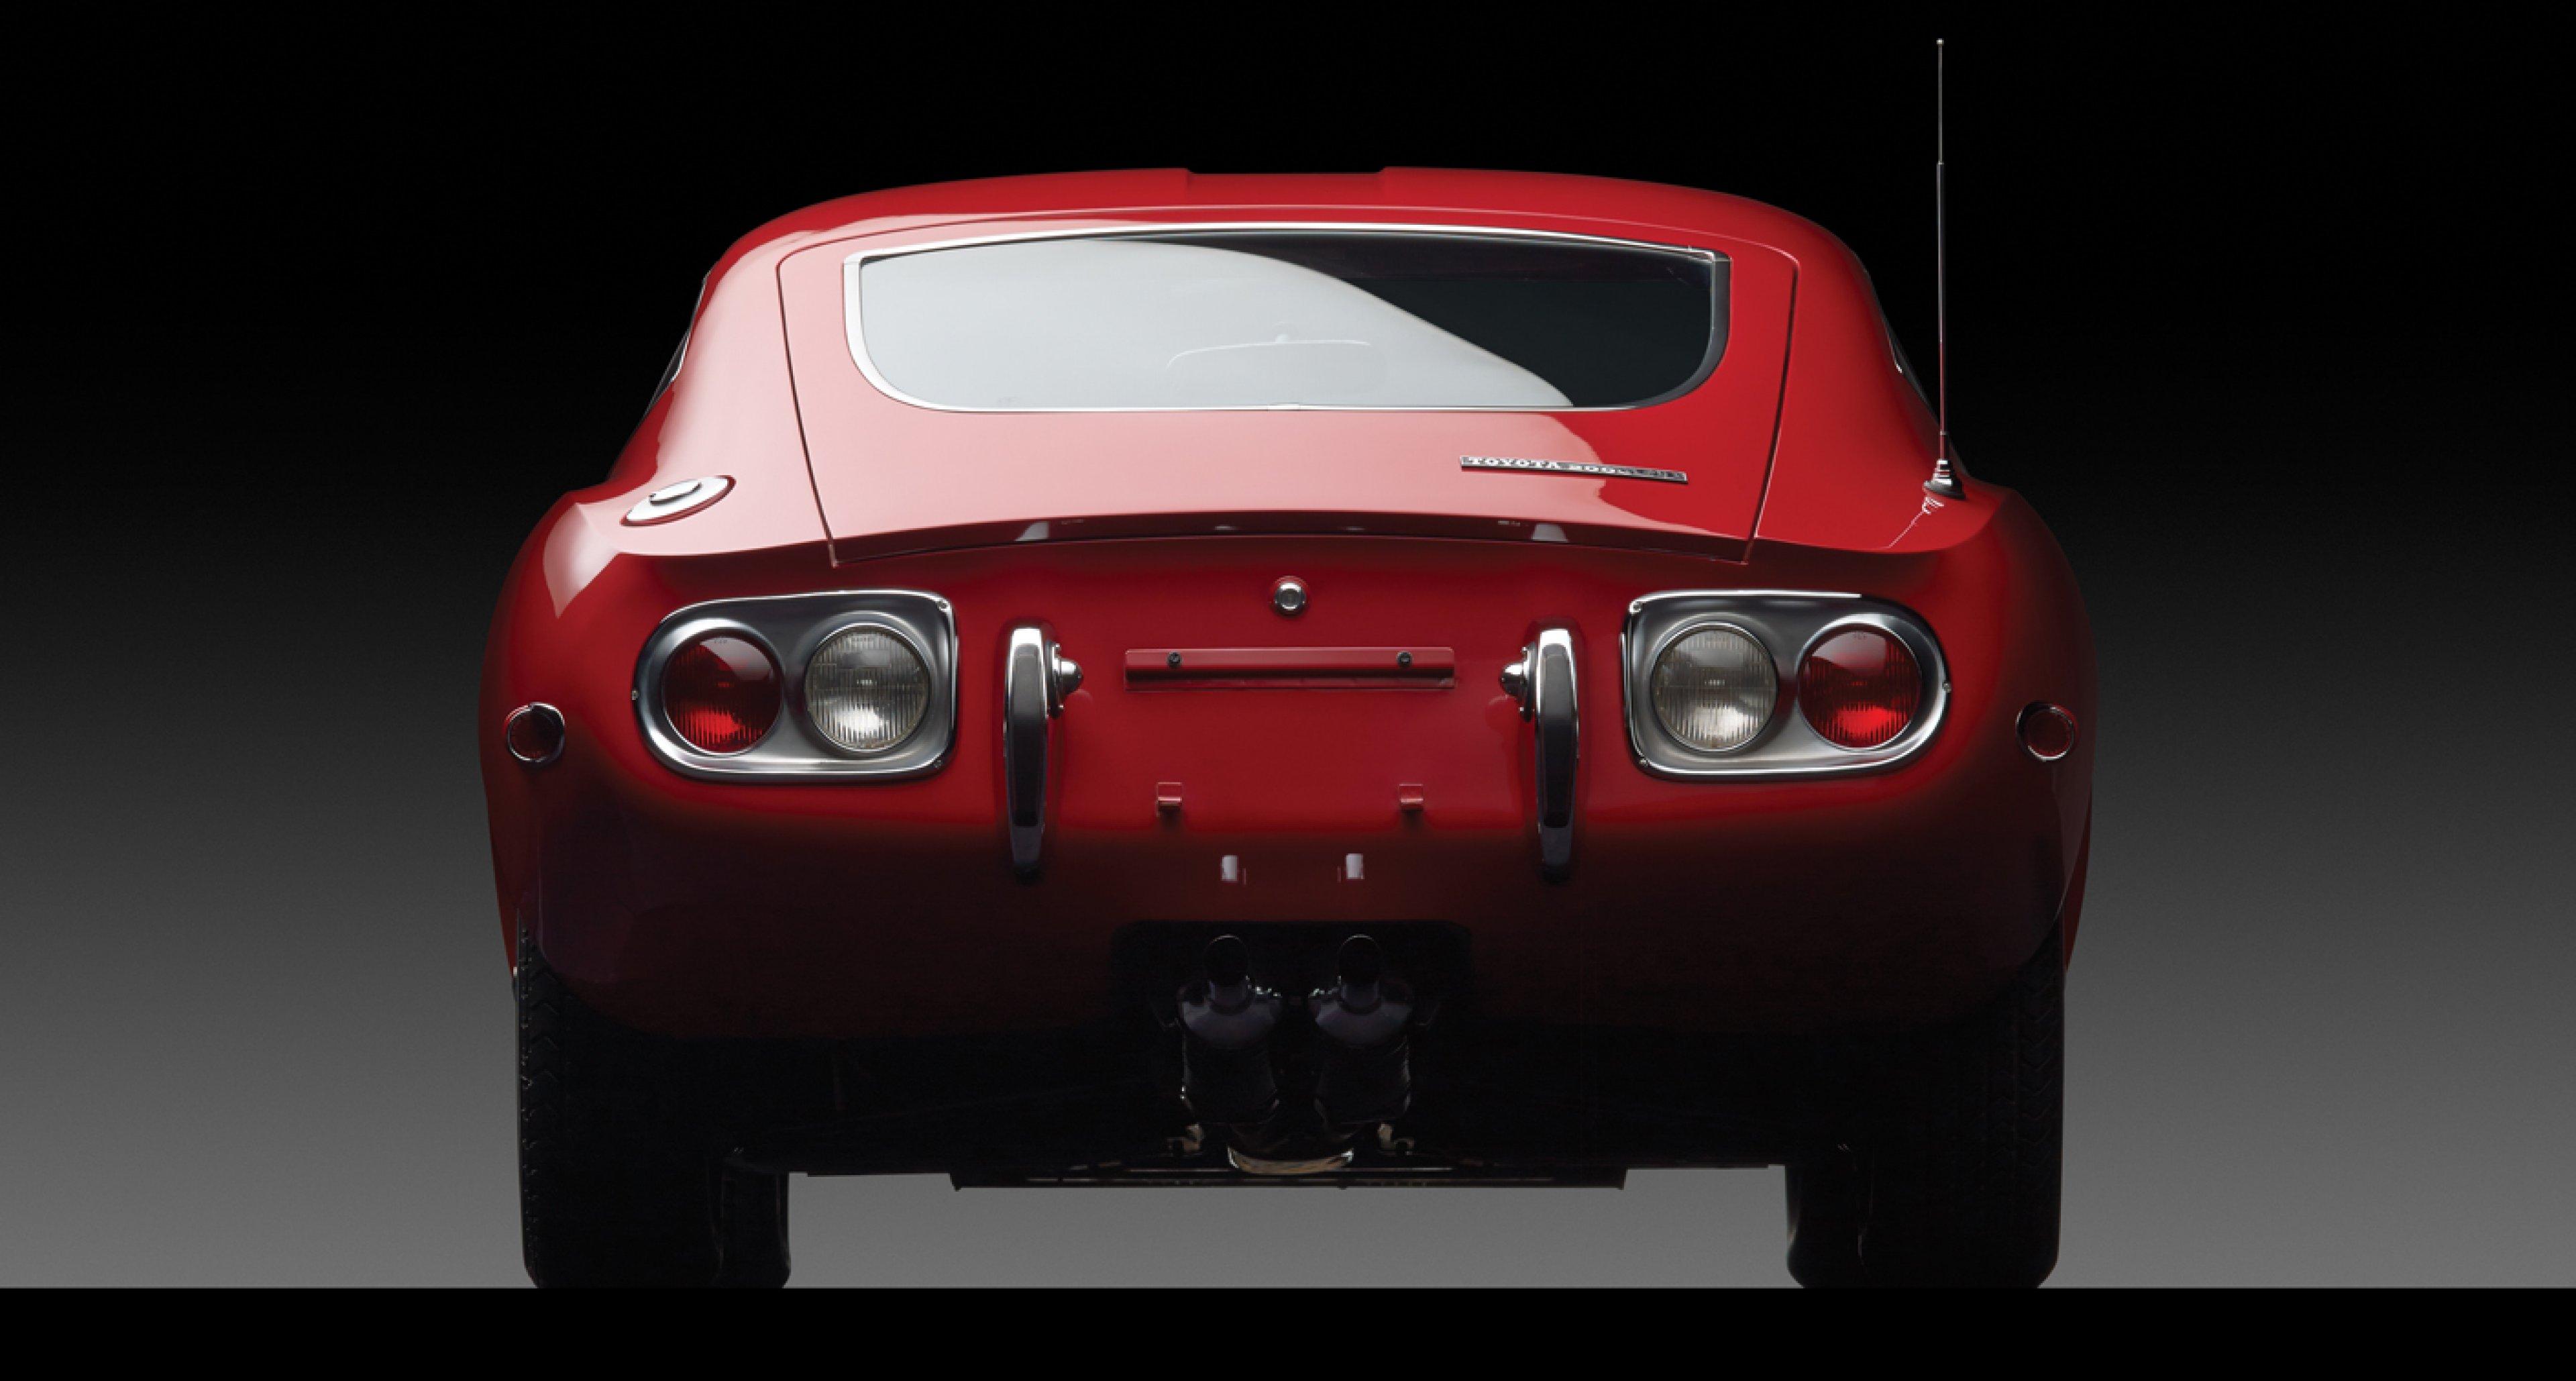 Toyota 2000GT: Japan's million-dollar E-type